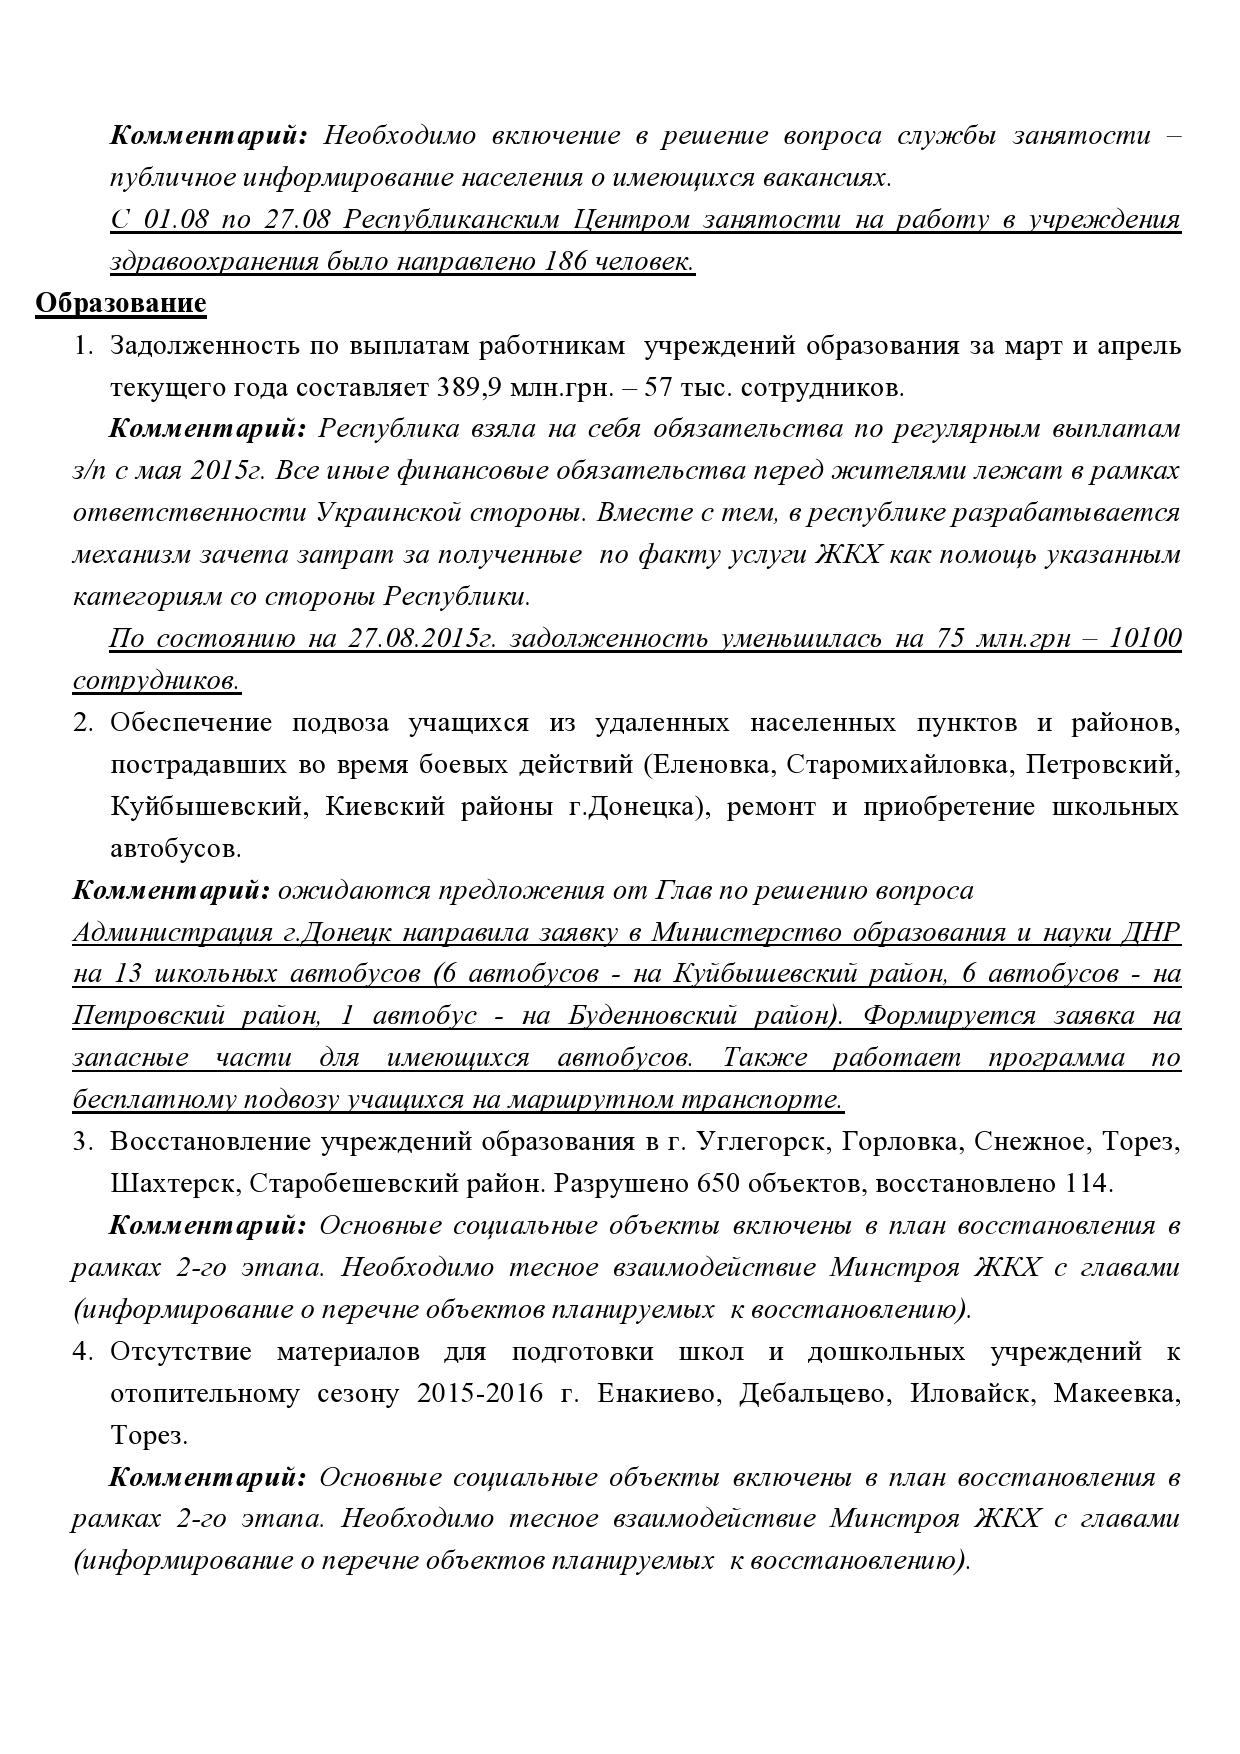 https://b0ltai.files.wordpress.com/2015/09/page00023.jpg